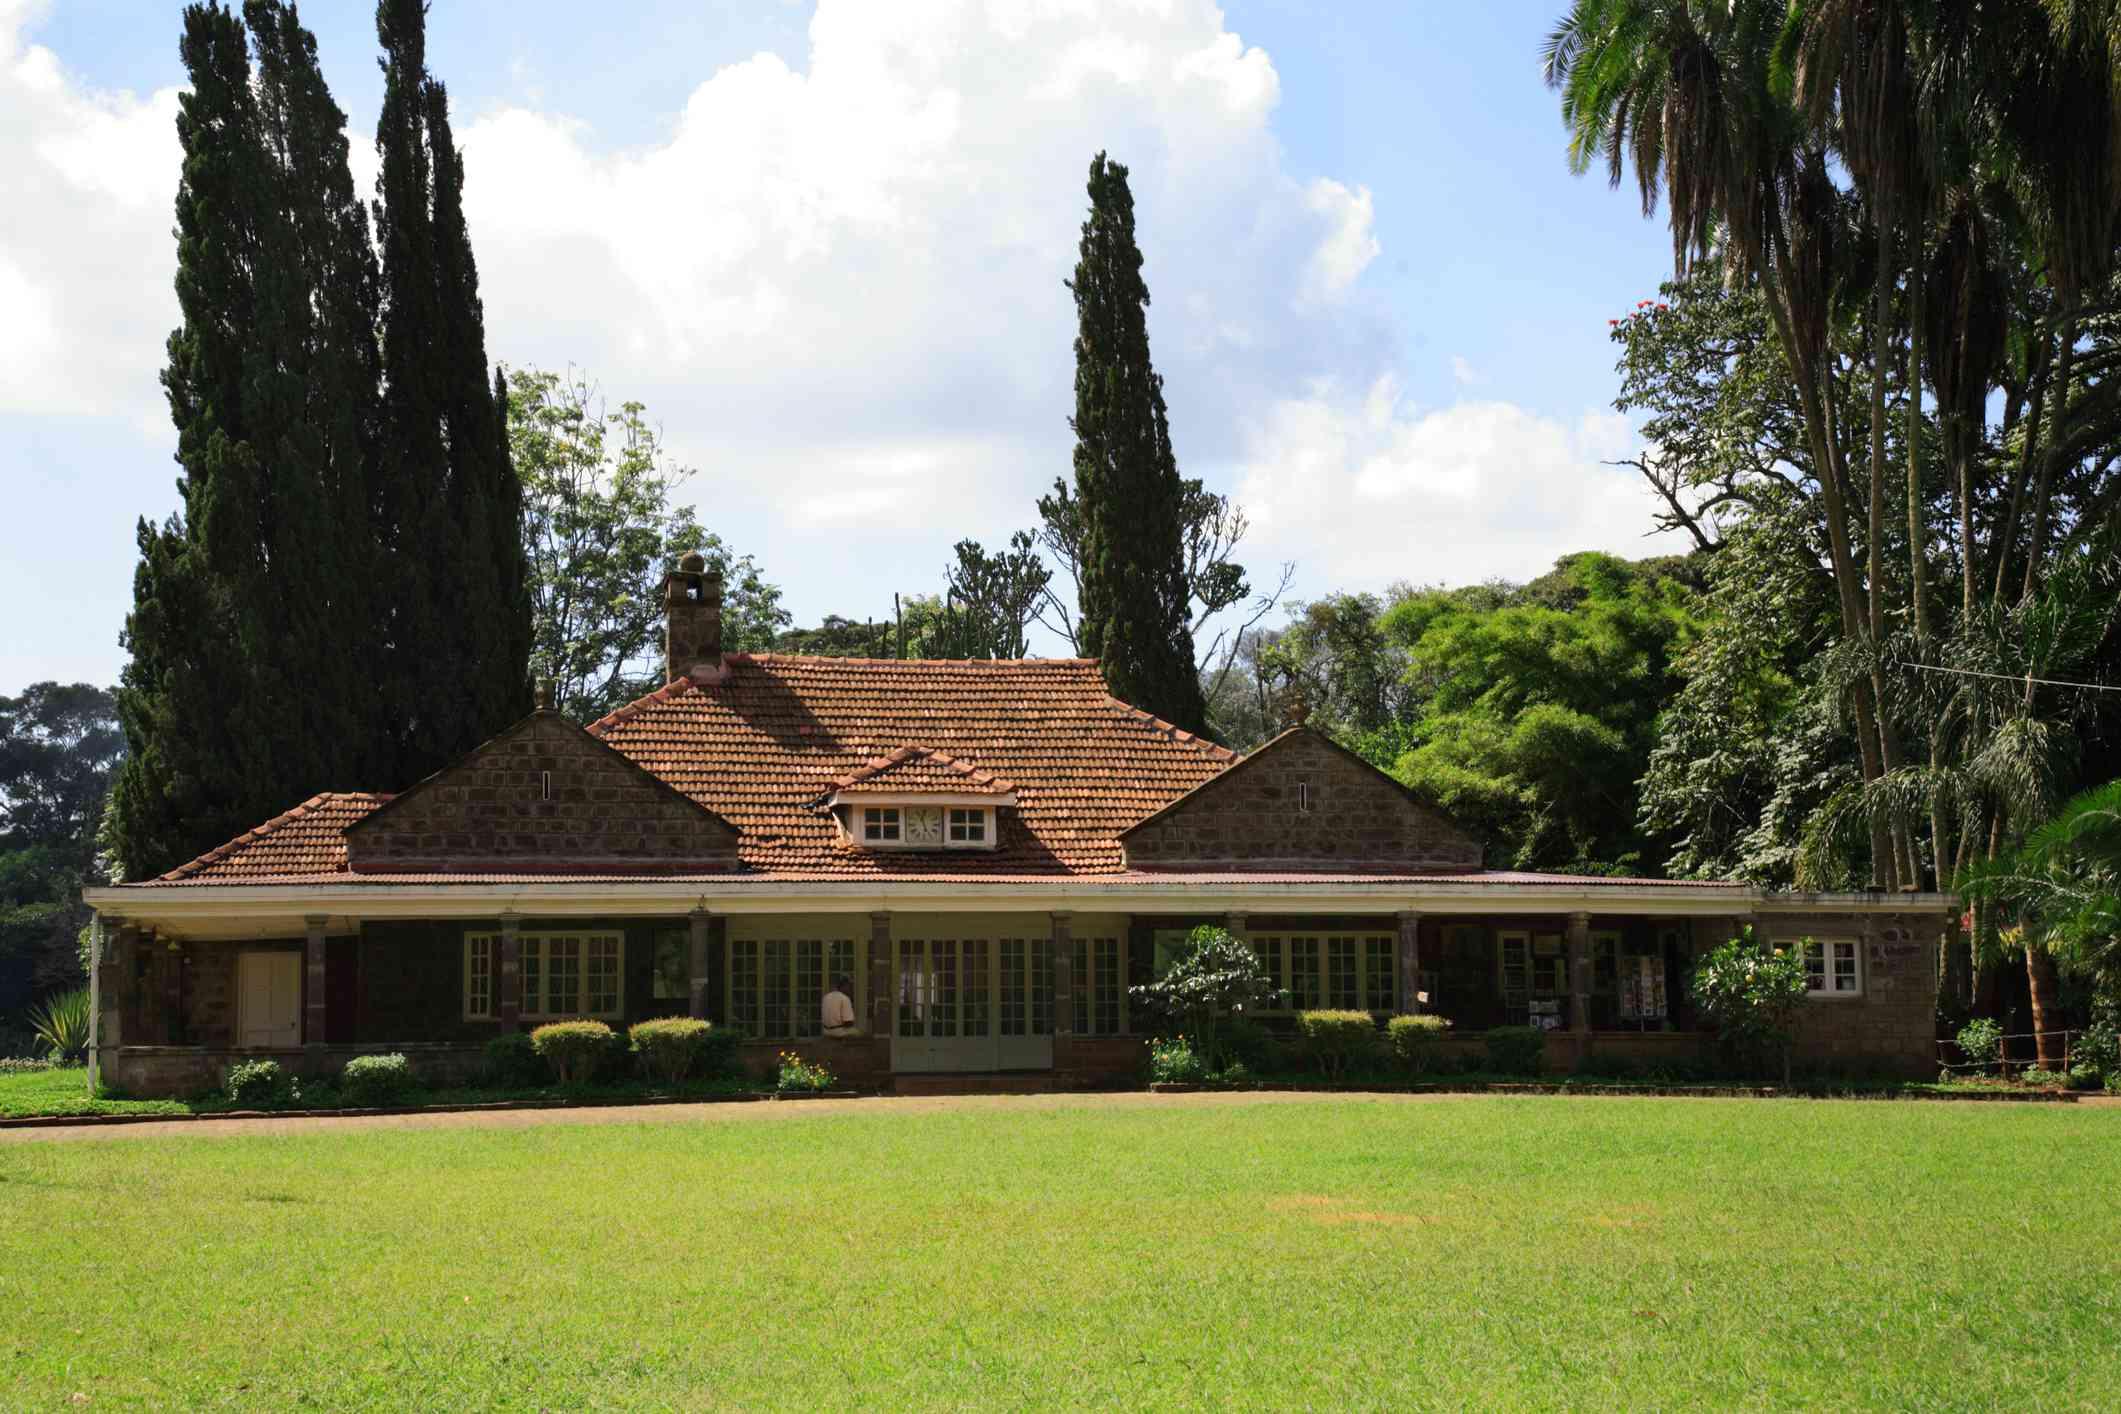 The Karen Blixen house Nairobi Kenya